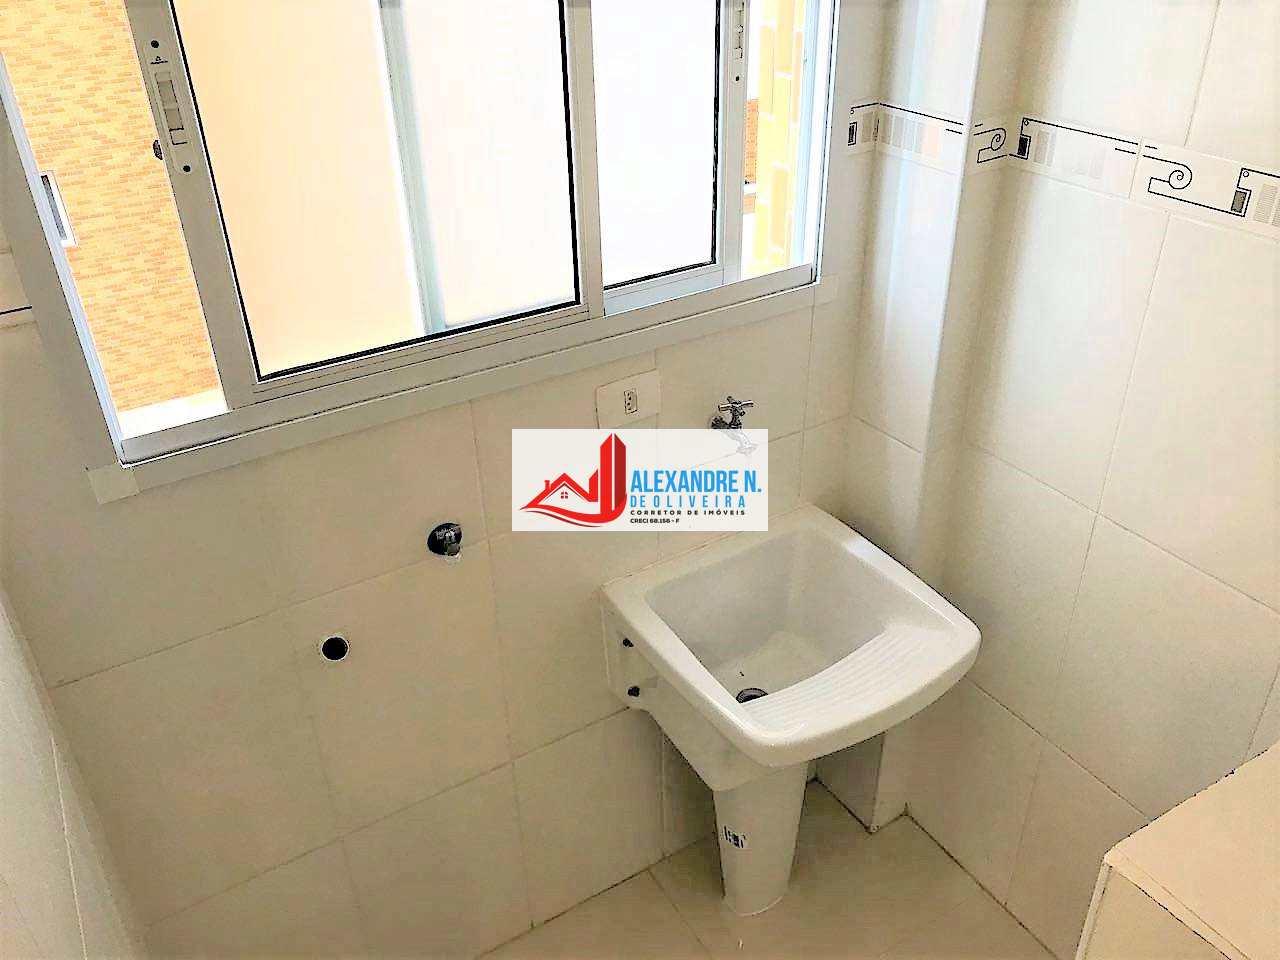 Apartamento 1 dorm, Forte, Praia Grande - R$ 280 mil, AP00703